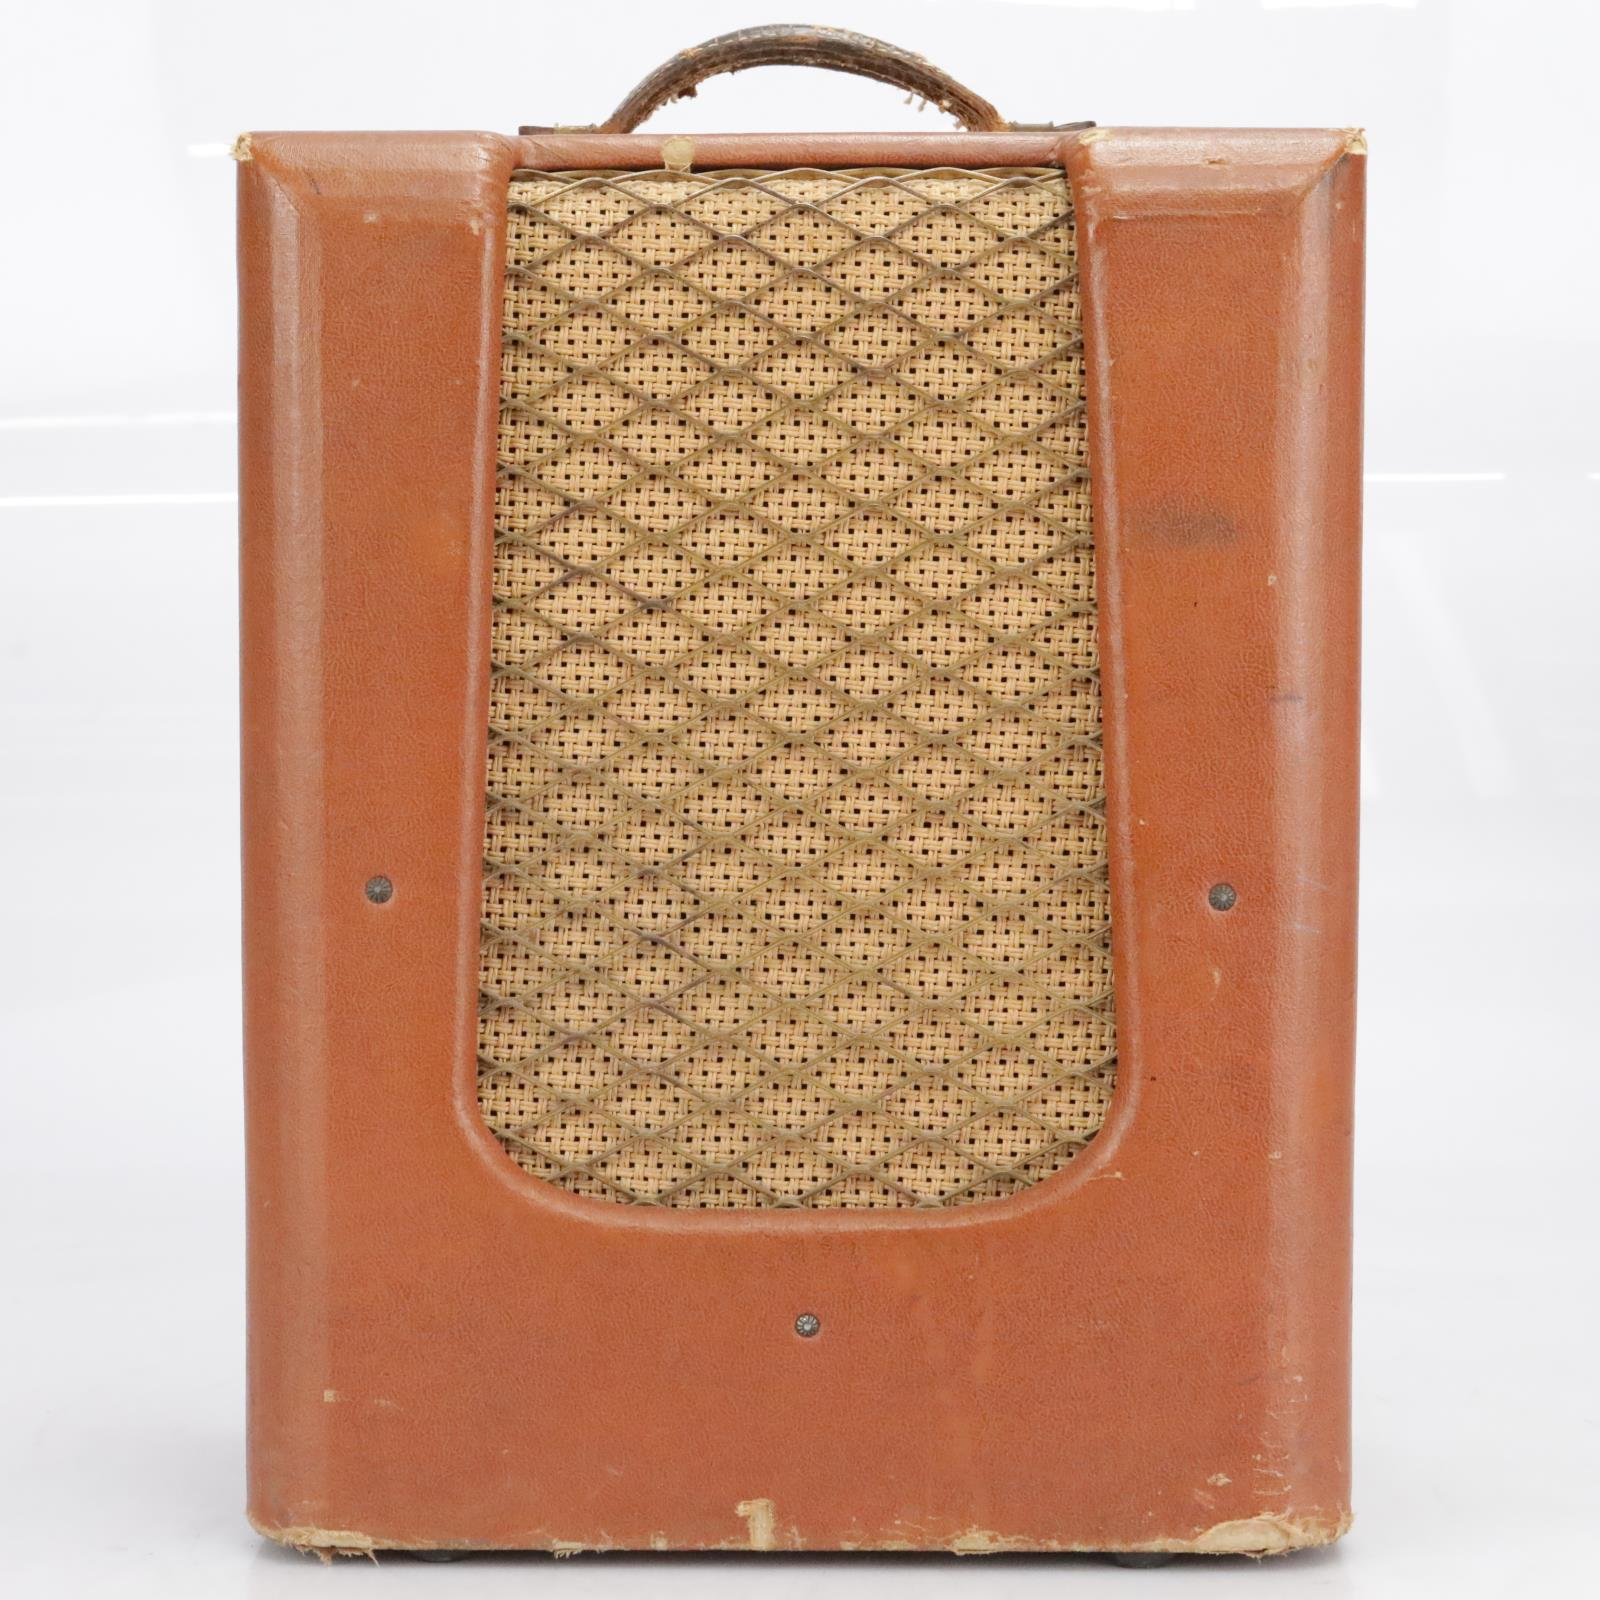 1950s Montgomery Ward 35 JDR Tube Guitar Combo Amplifier #41589